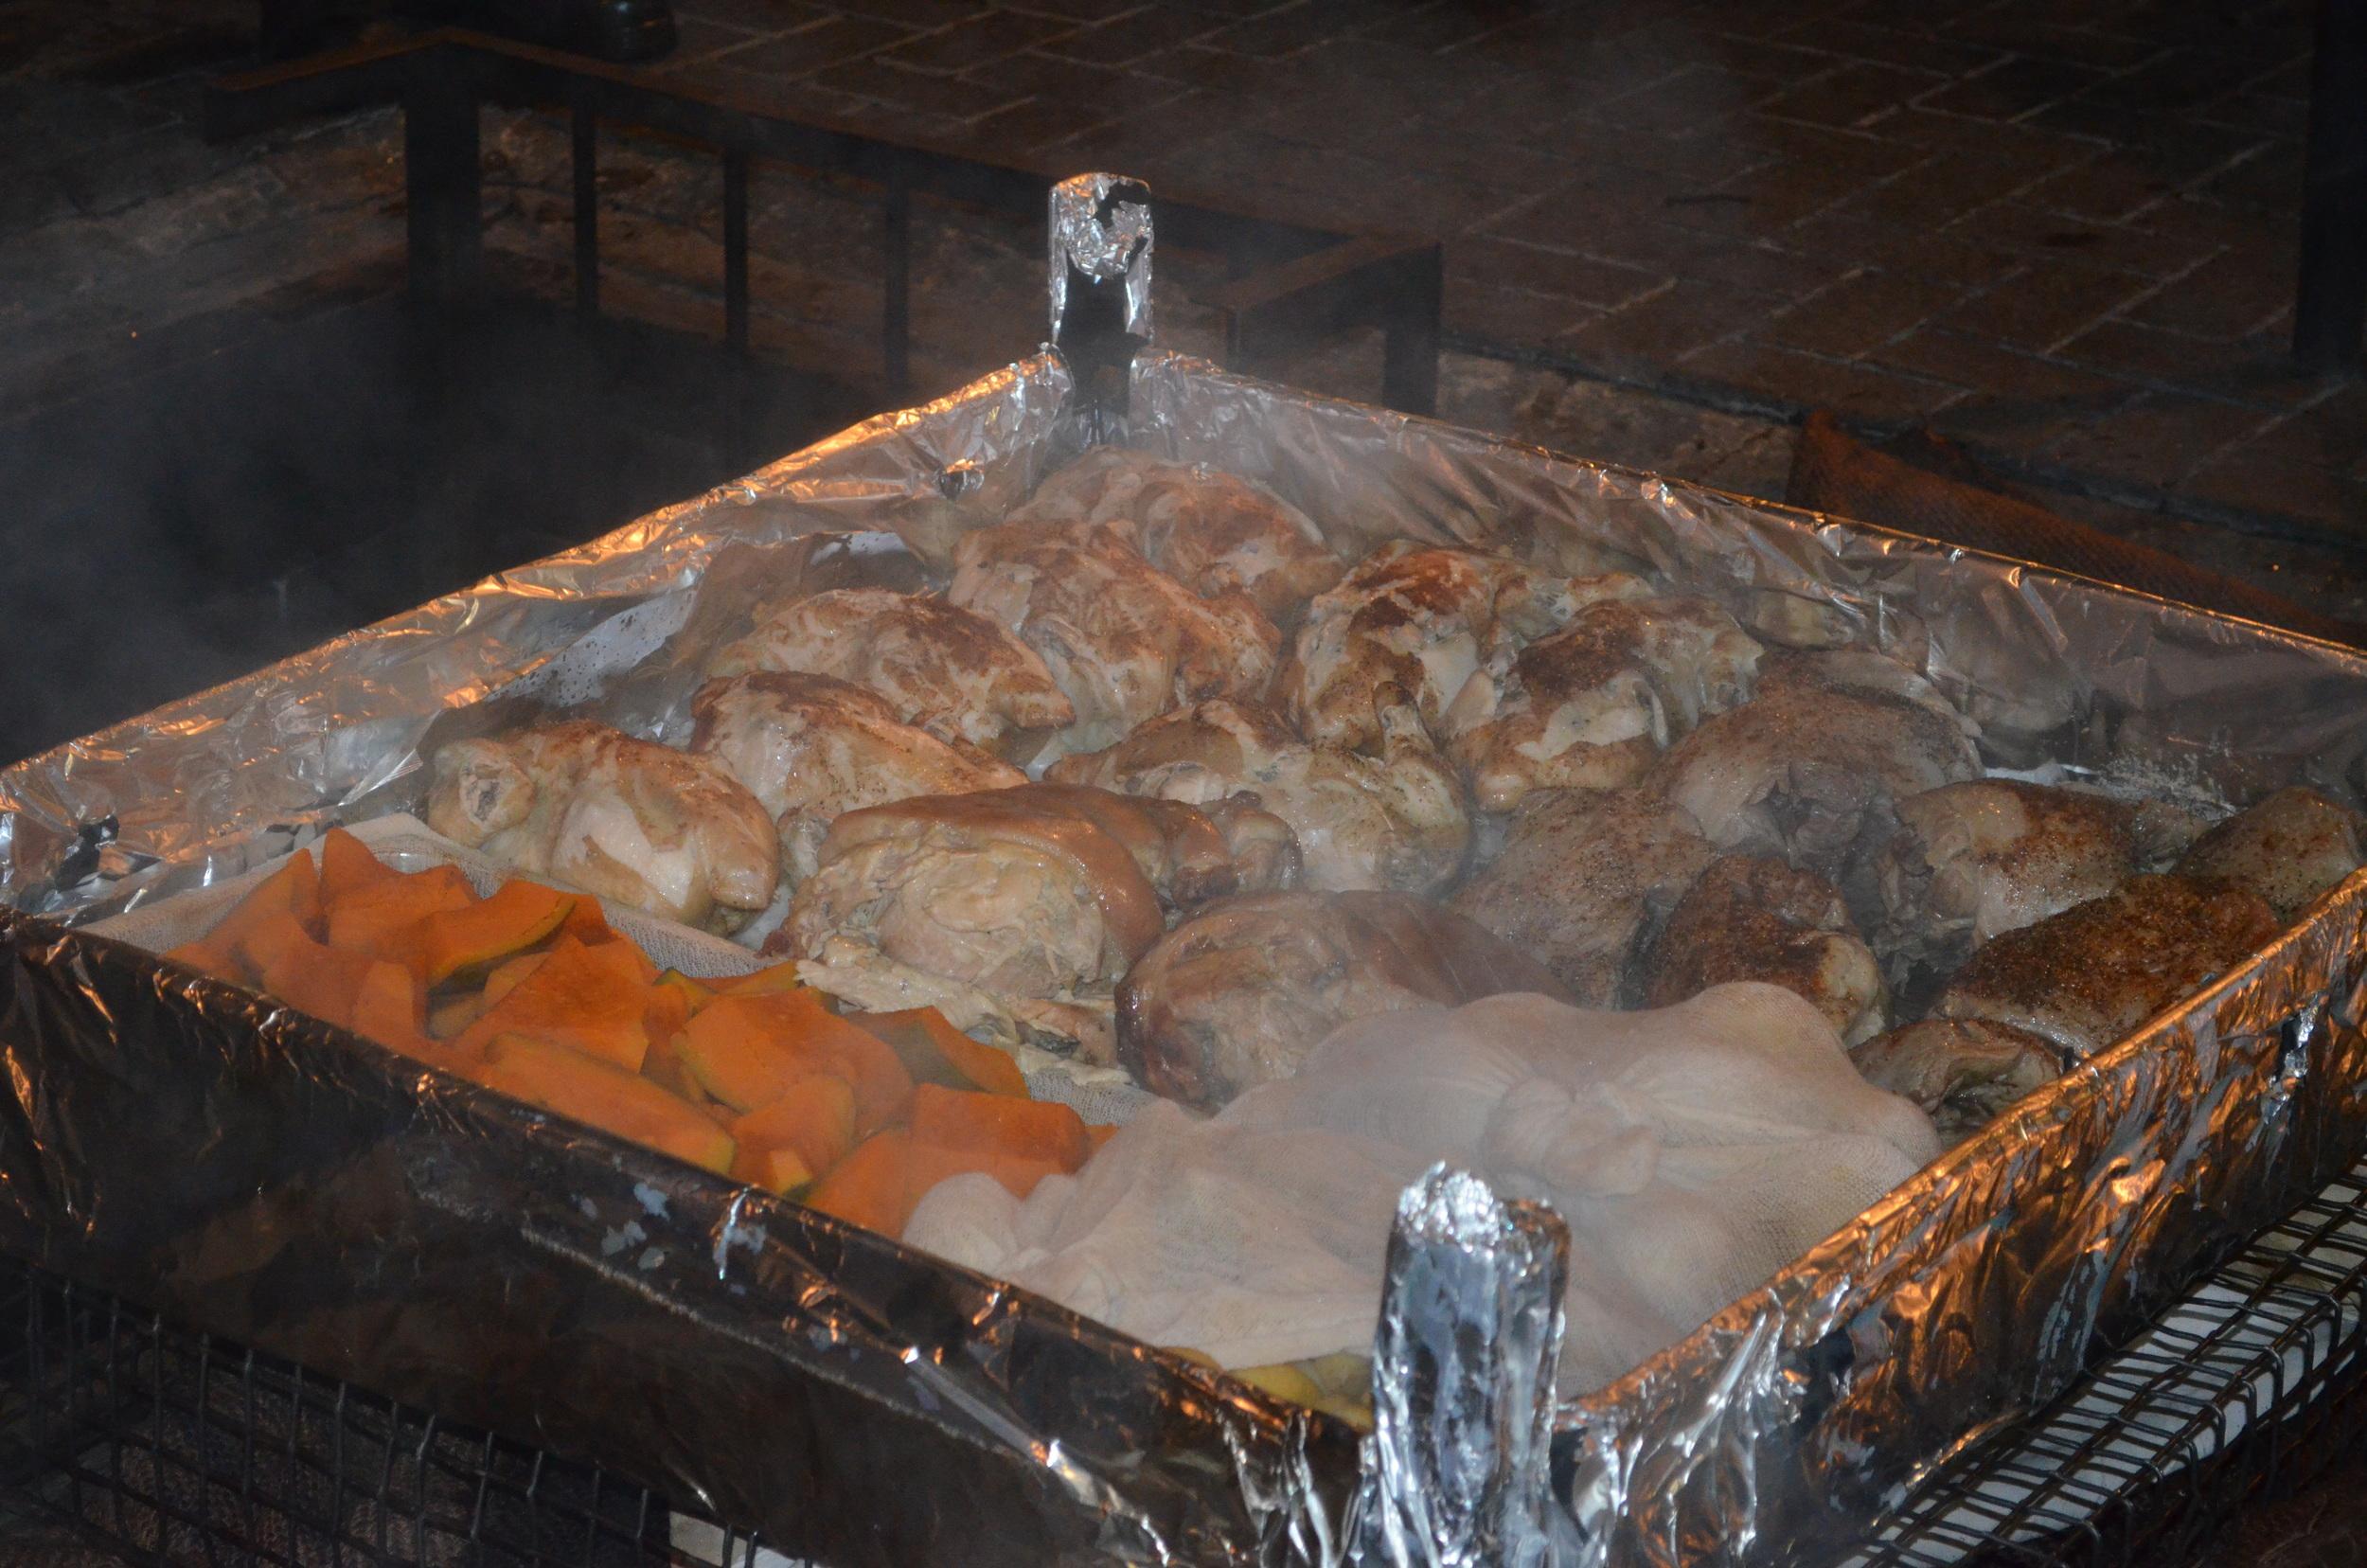 Pork, lamb, chicken, and kumera roasting in the pit. Kumera is one of my new favorite New Zealand! It's similar to a sweet potato.